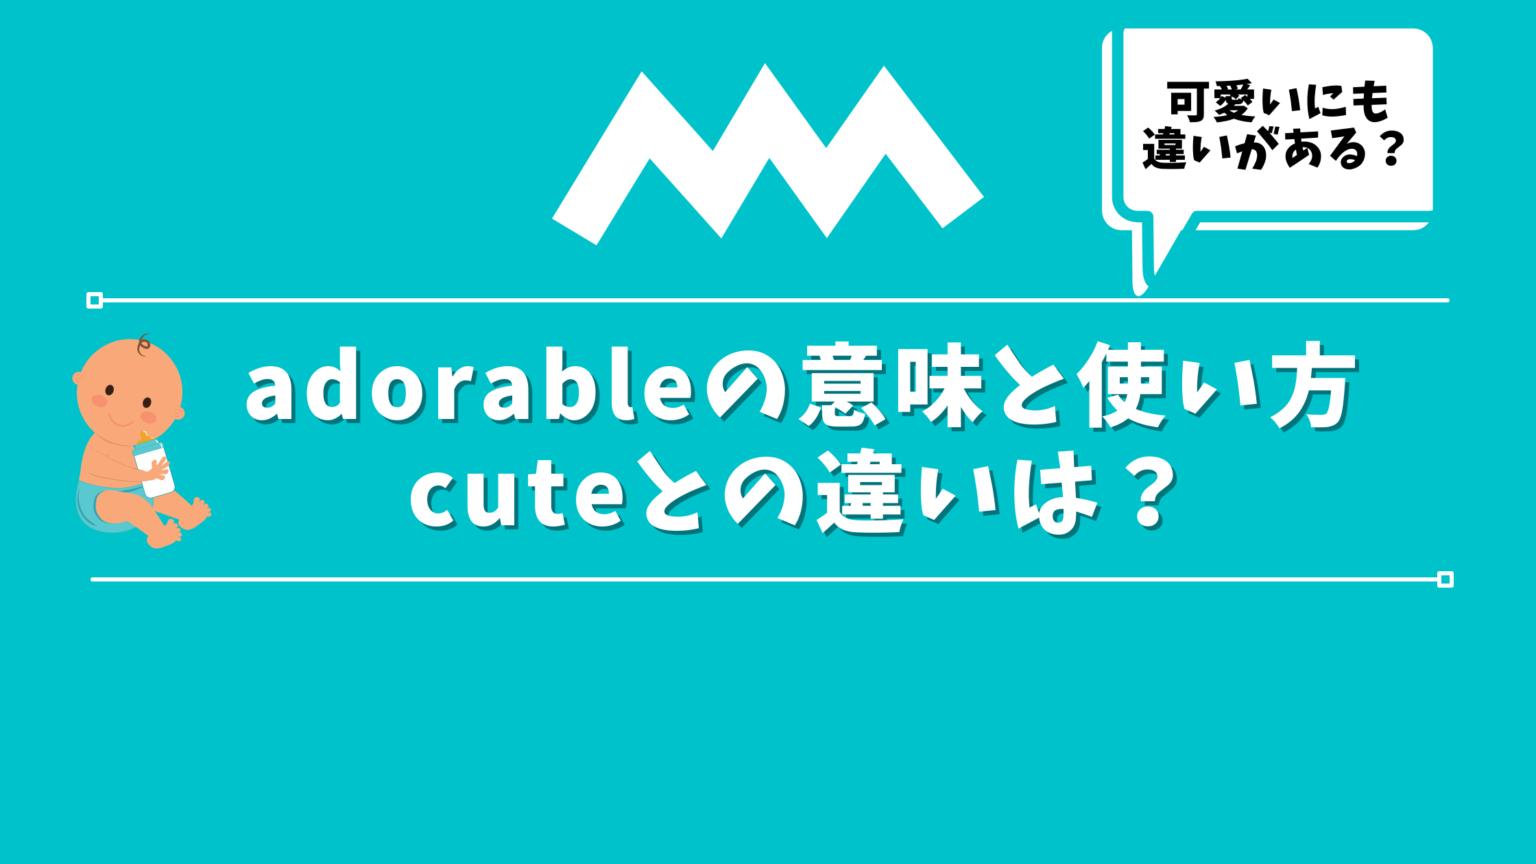 adorable の意味と使い方 cute との違いは?